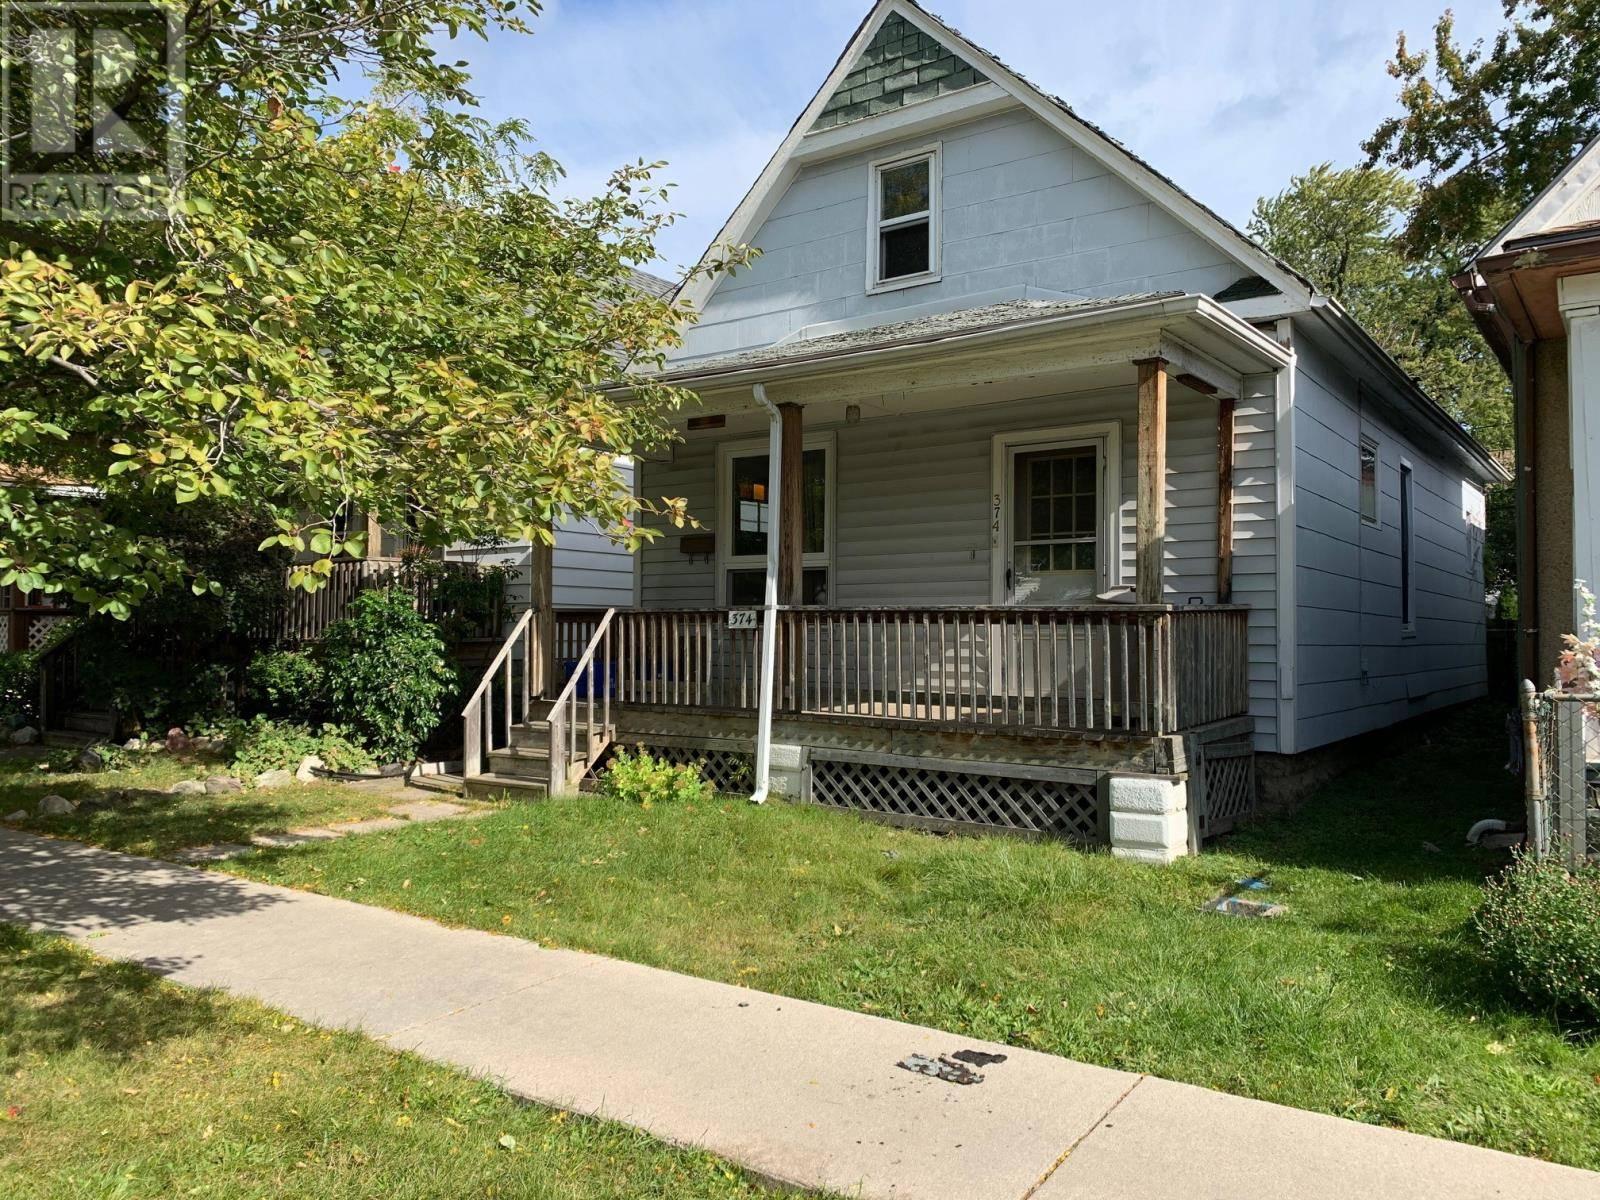 House for sale at 374 Bridge  Windsor Ontario - MLS: 19027122